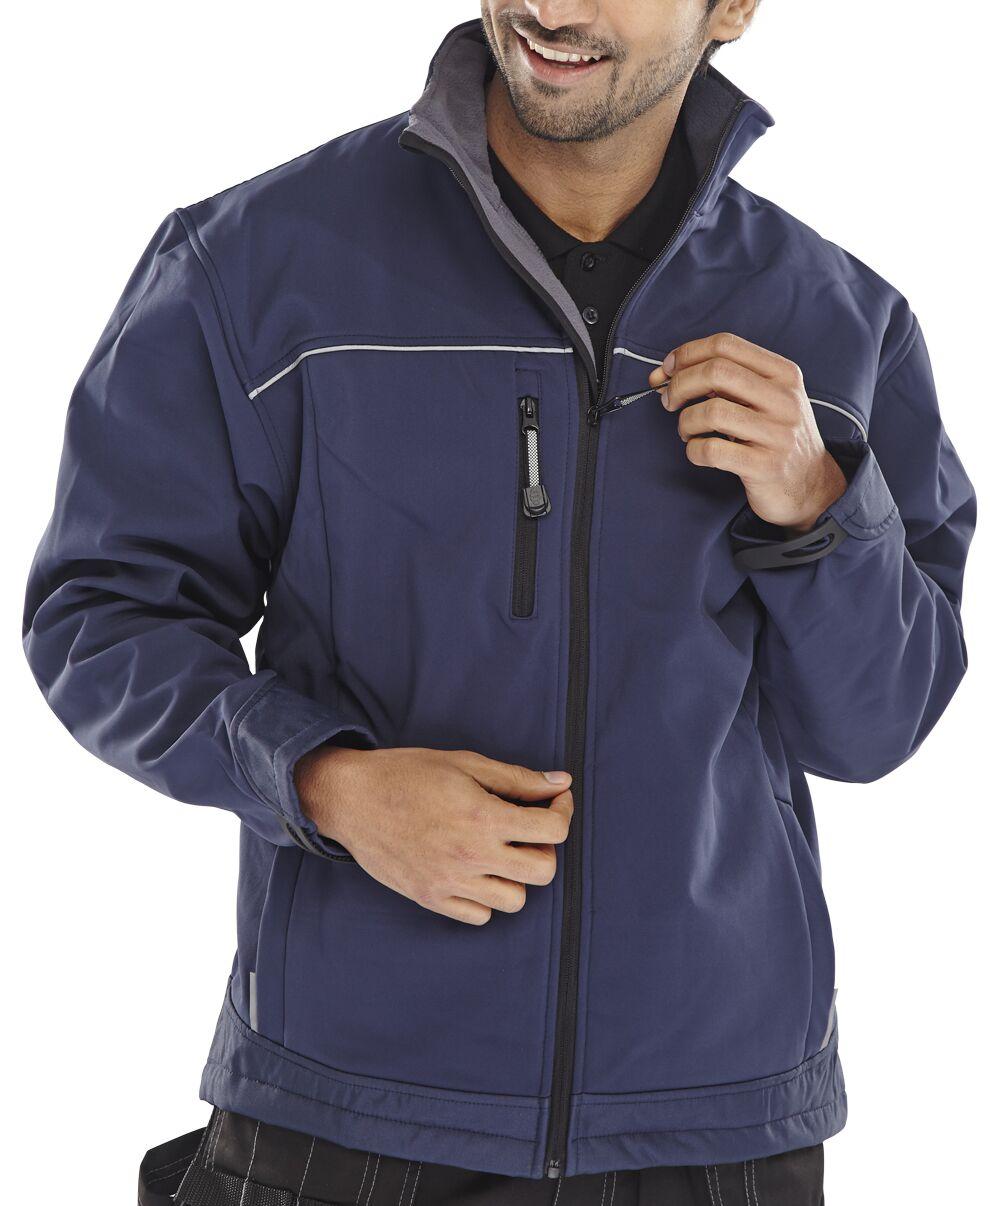 Poly-Cotton Workwear - Soft Shell Jacket Navy Xxl